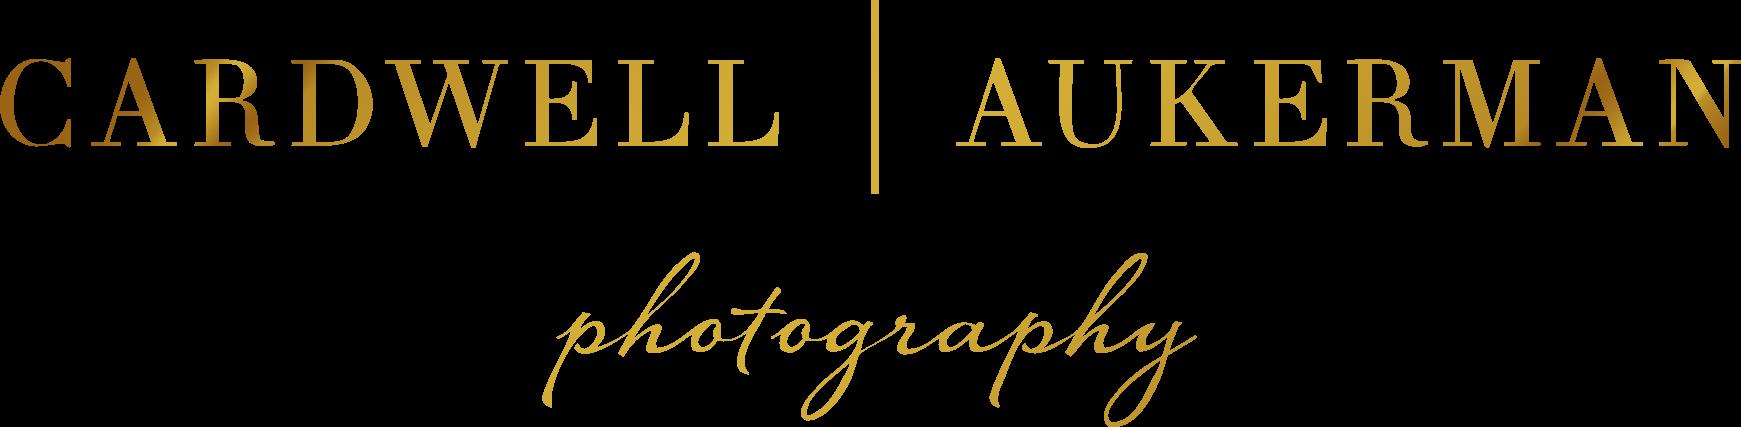 Online Gallery